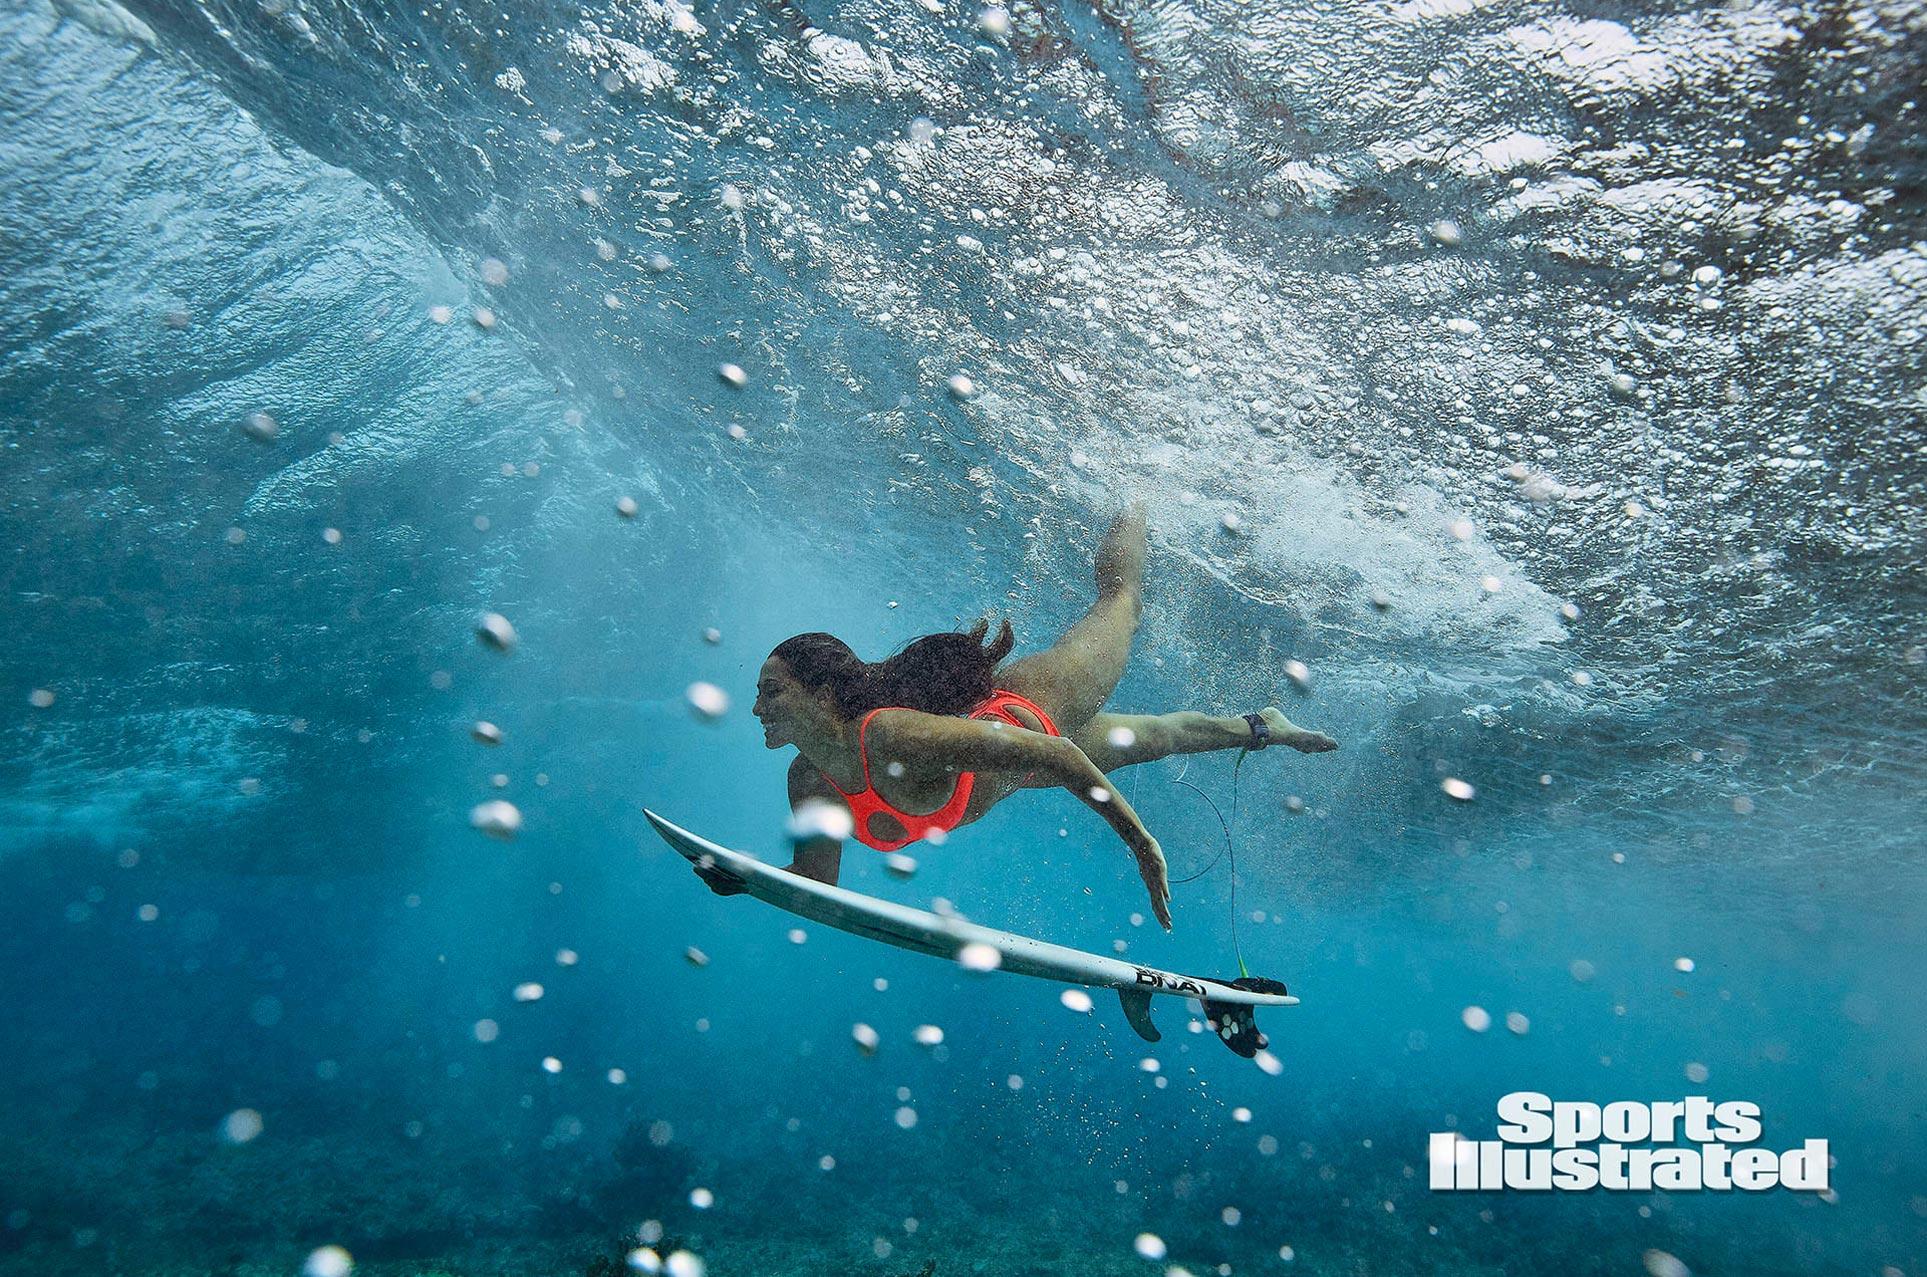 Малия Мануэль в каталоге купальников Sports Illustrated Swimsuit 2020 / фото 06